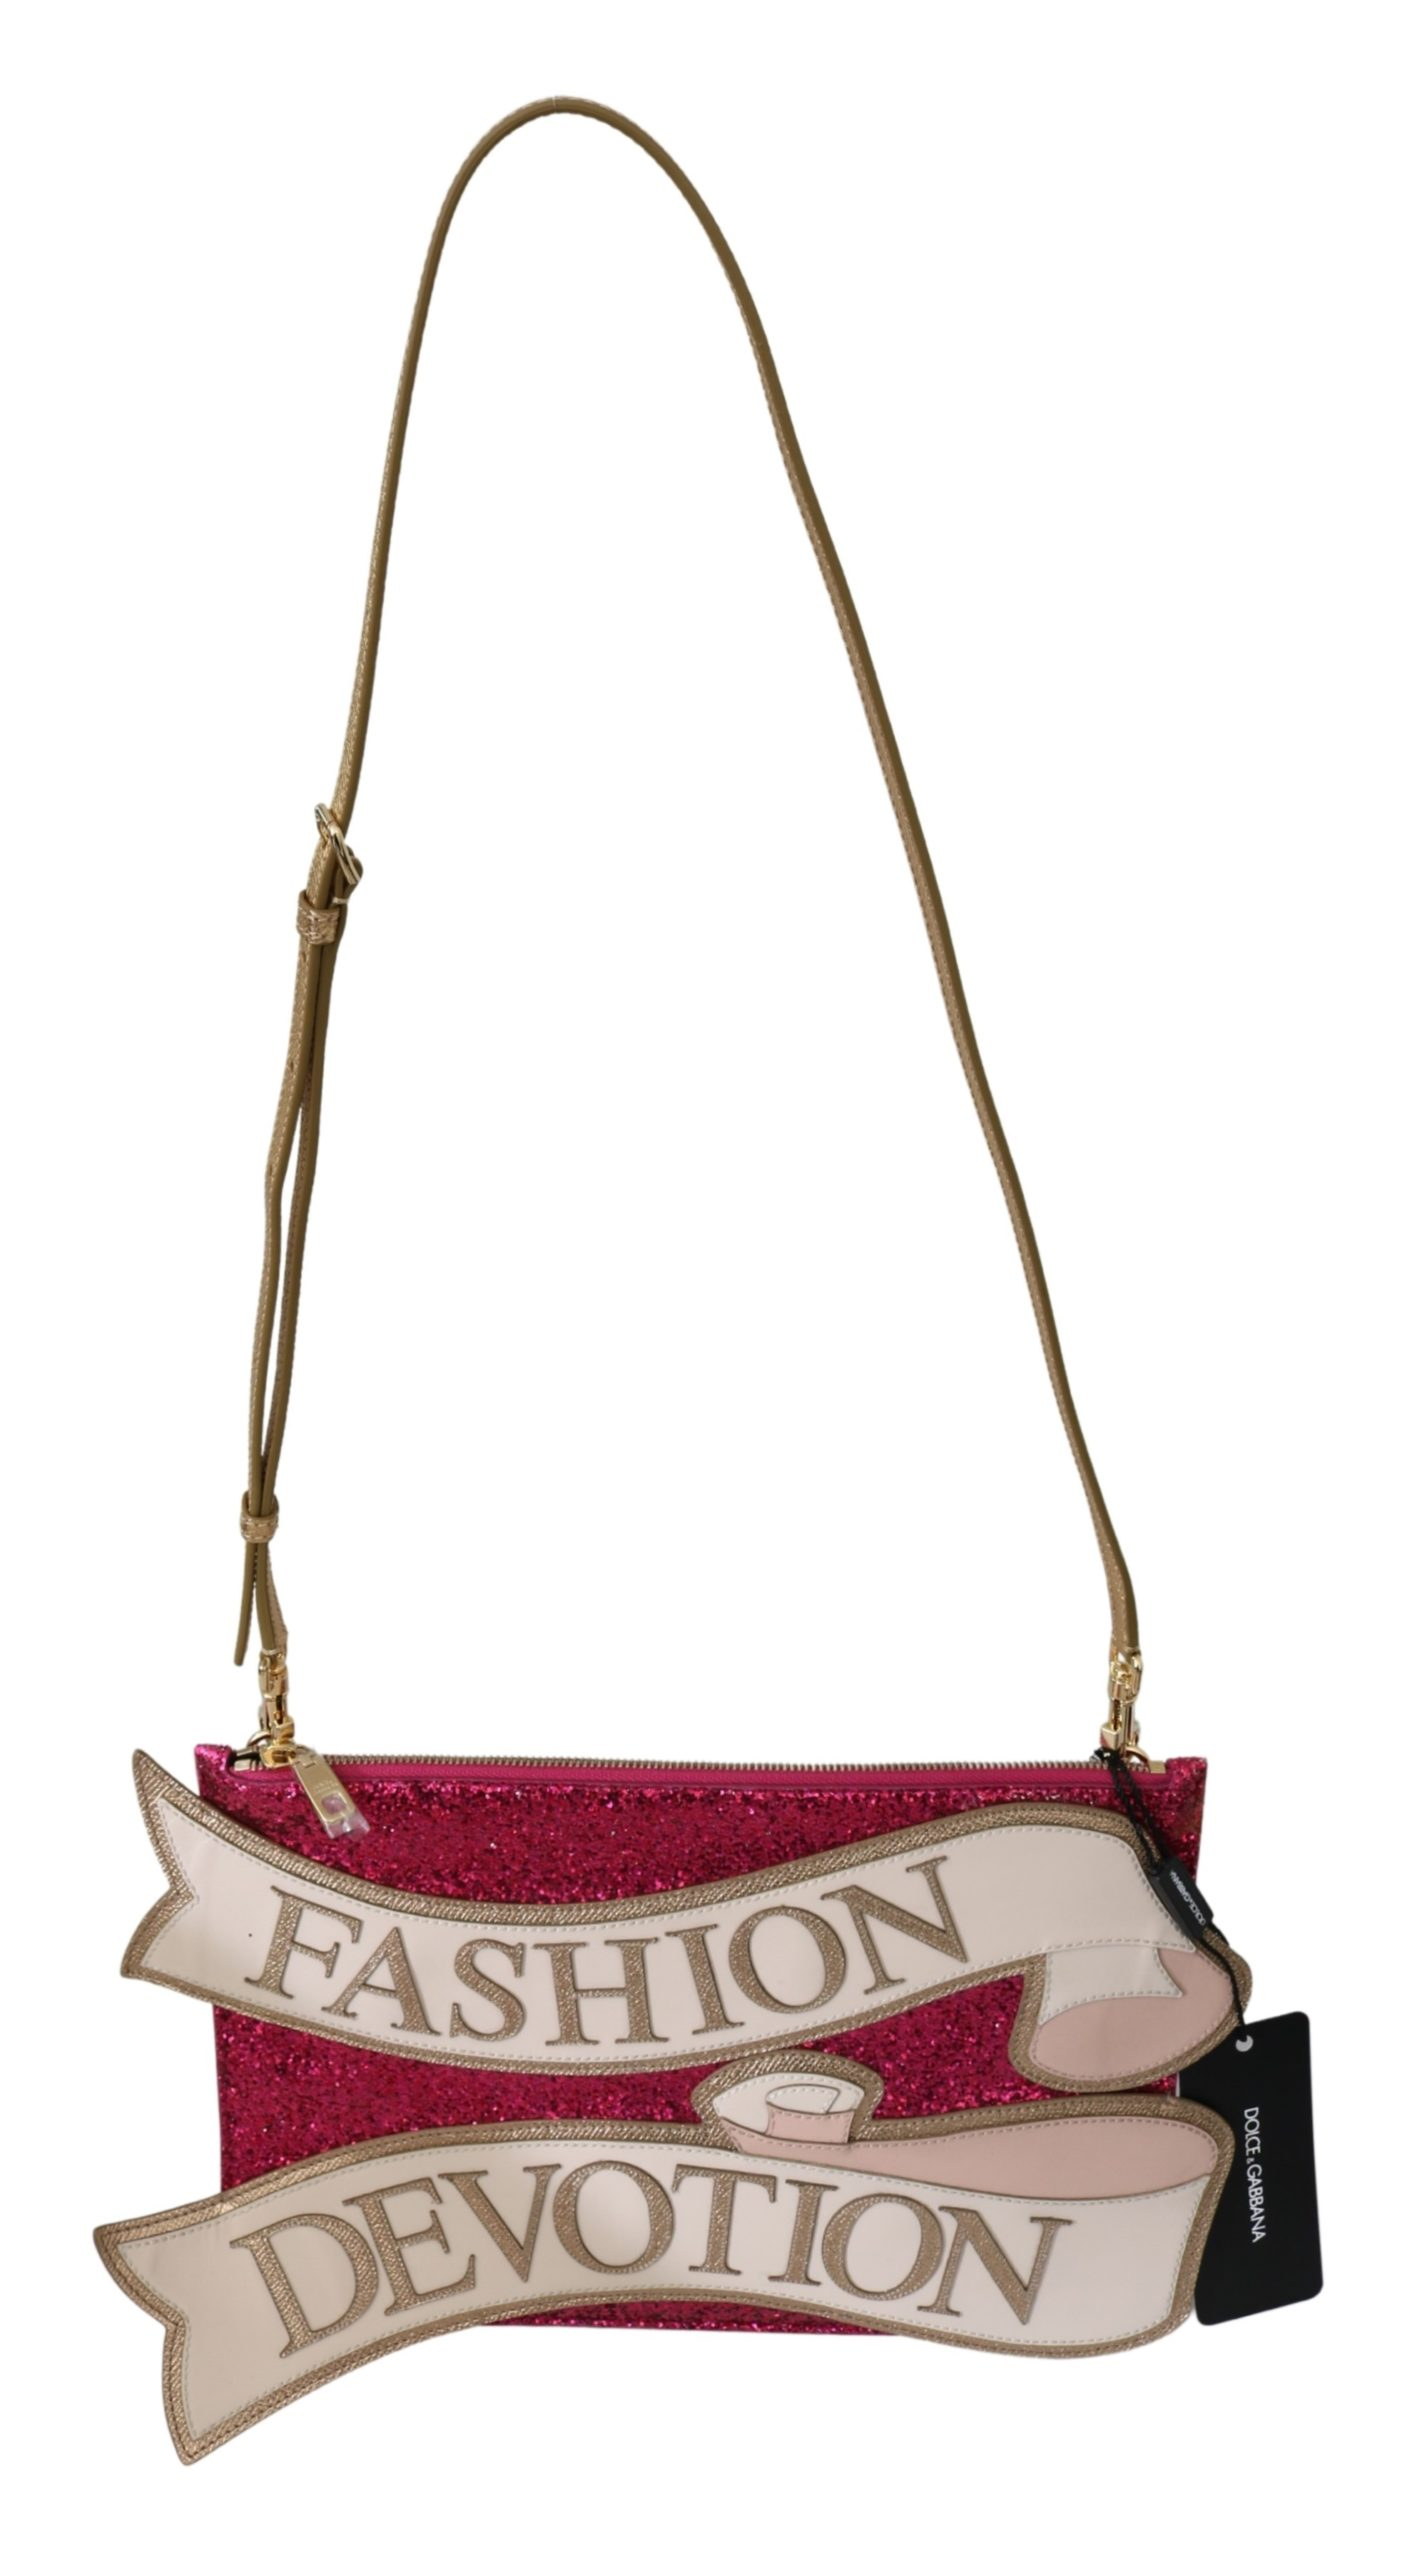 Dolce & Gabbana Women's Glittered Fashion Devotion Shoulder Bag Pink VAS9857